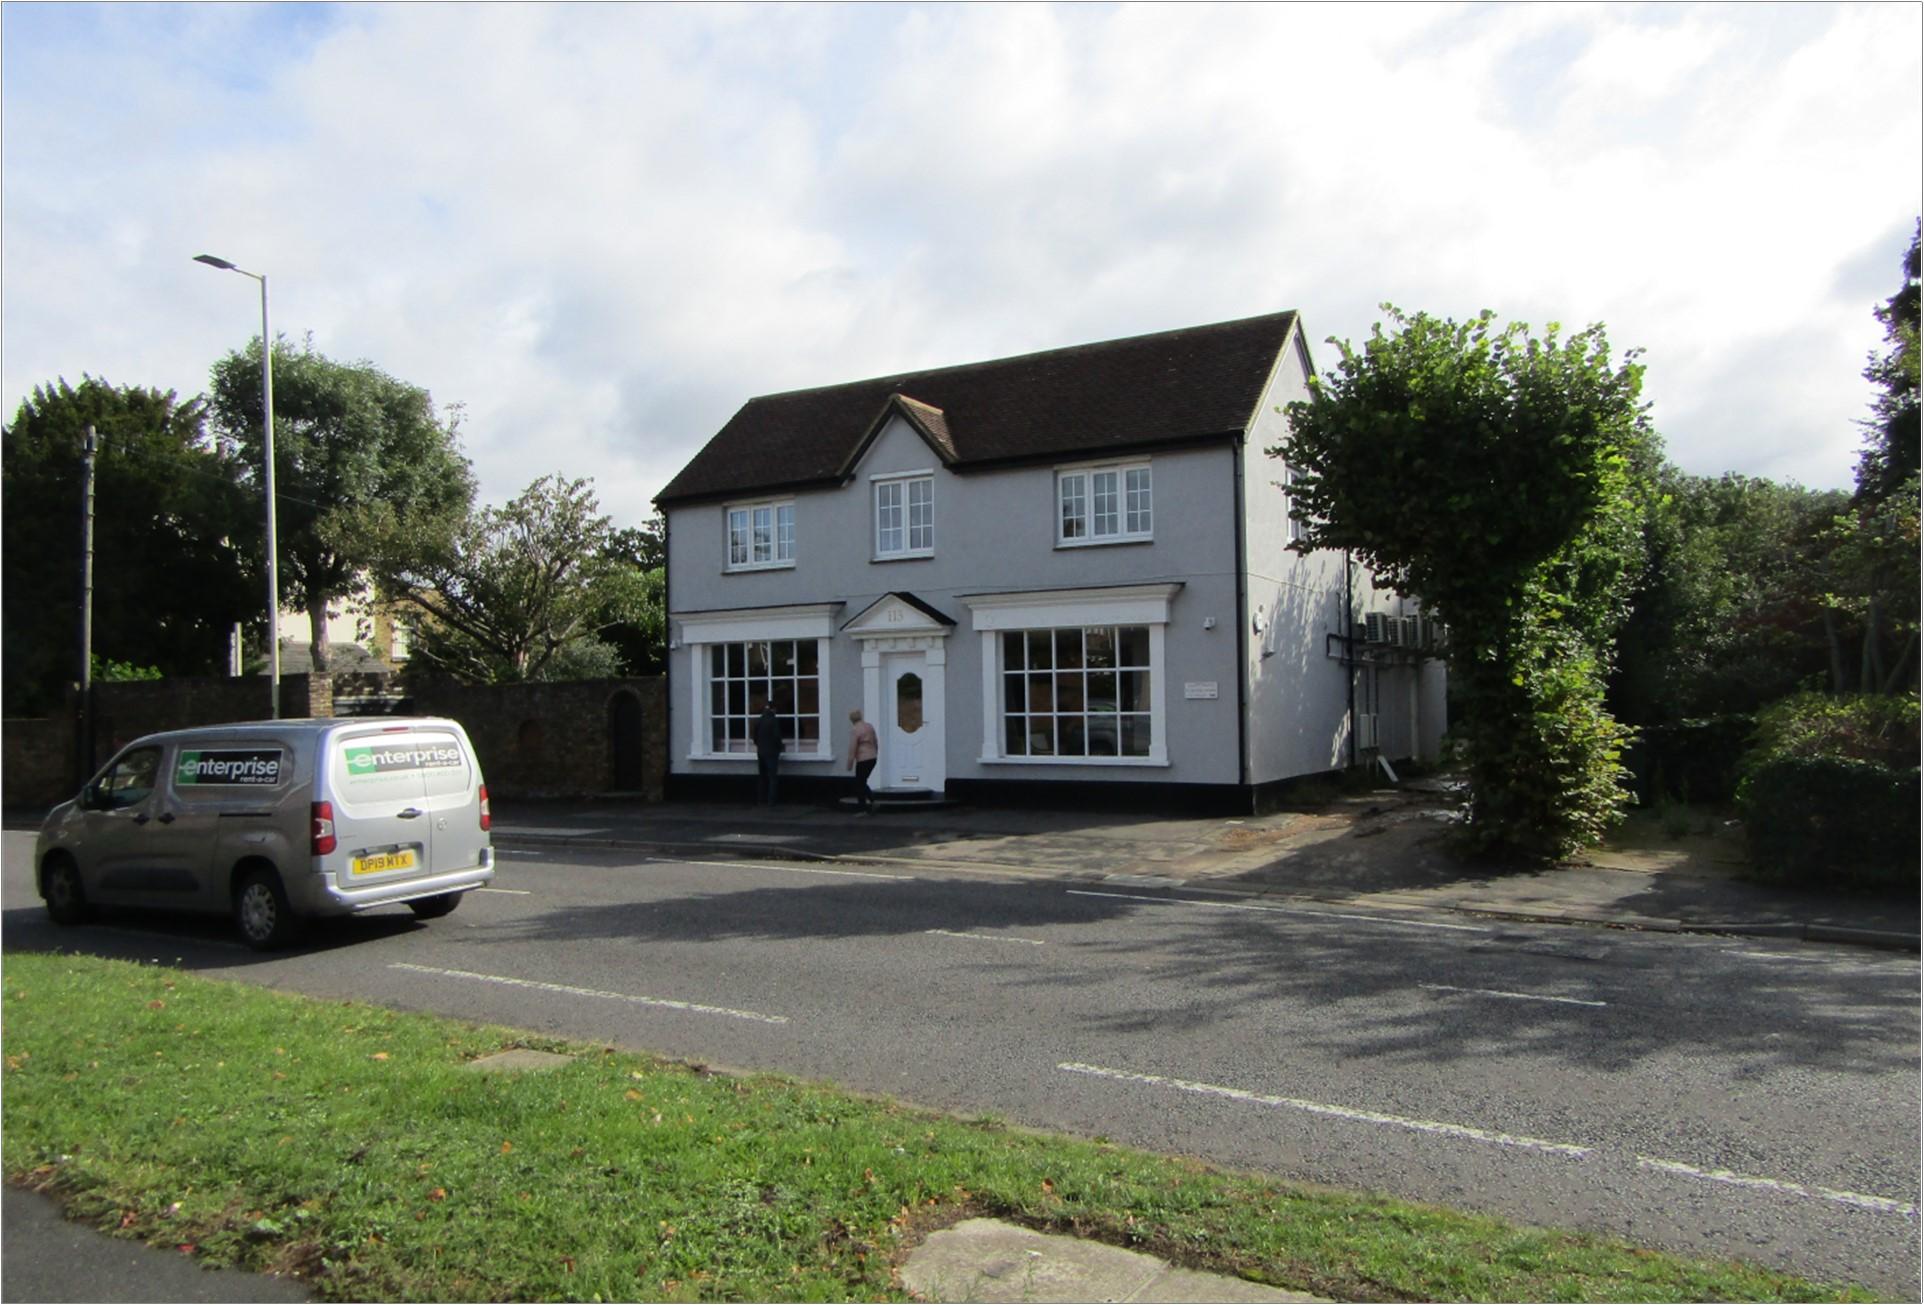 113 High Road, Broxbourne